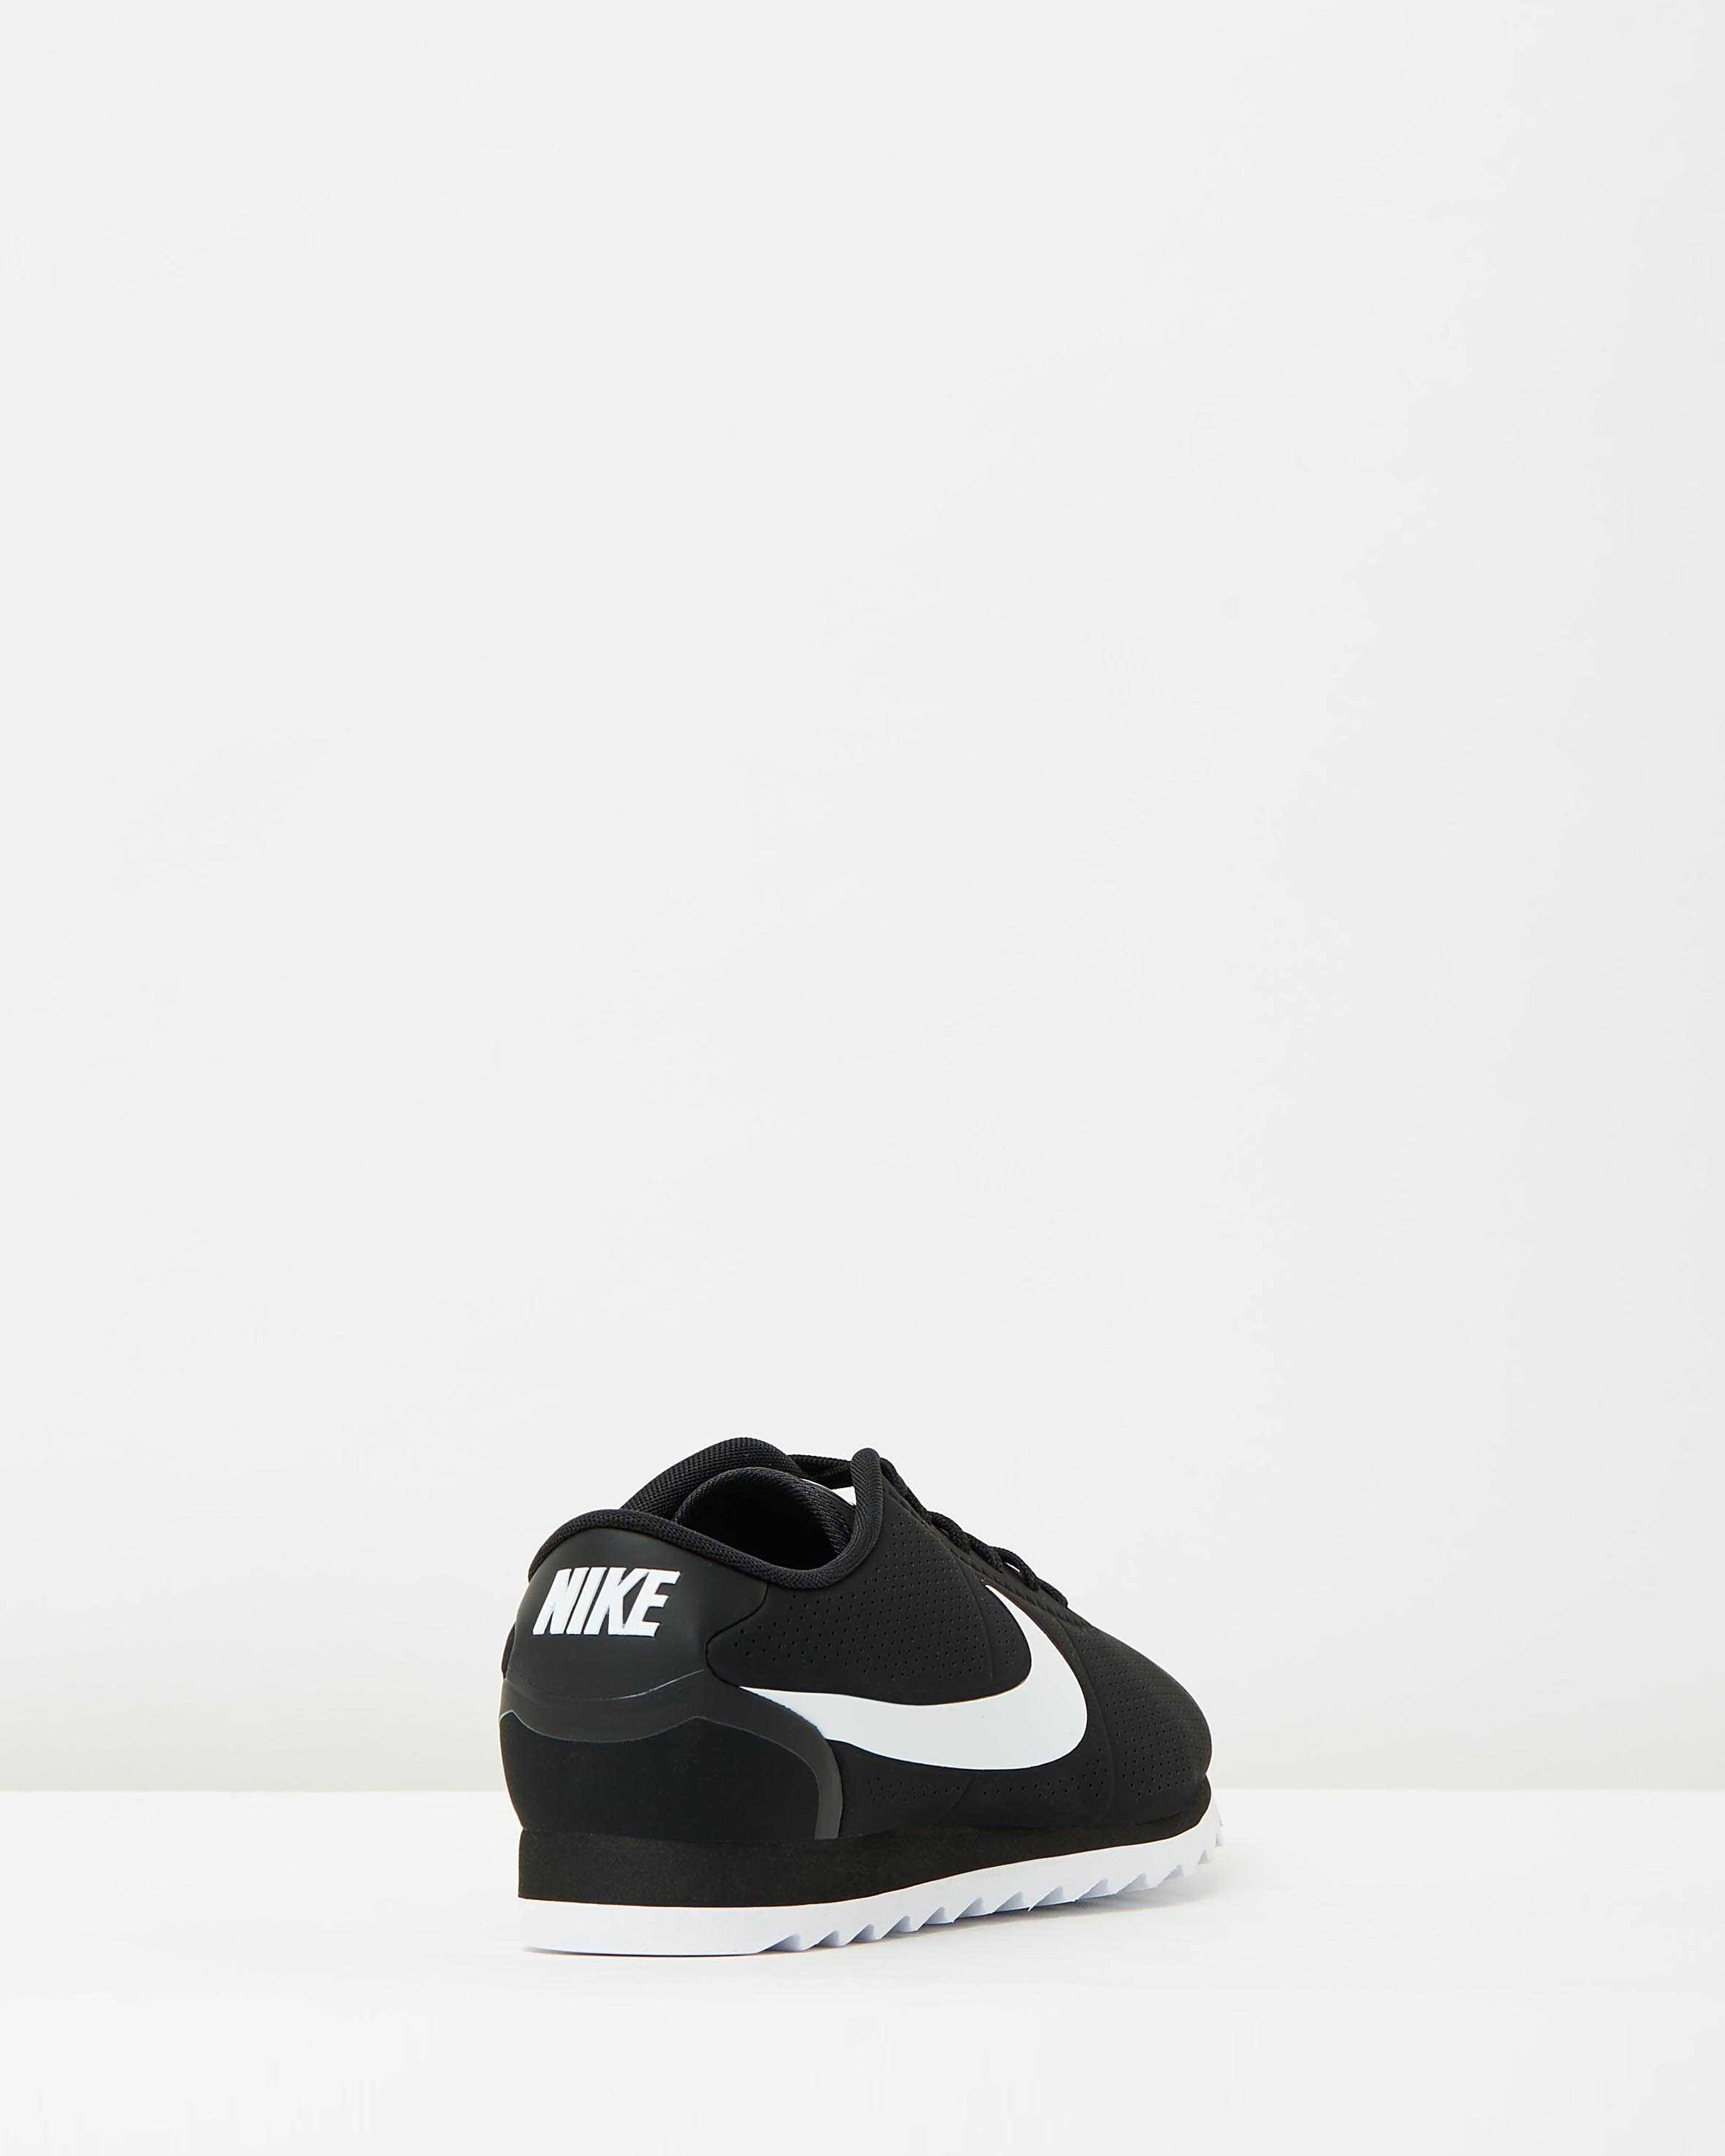 huge discount a8770 bce64 Women's Nike Cortez Ultra Moire Black & White